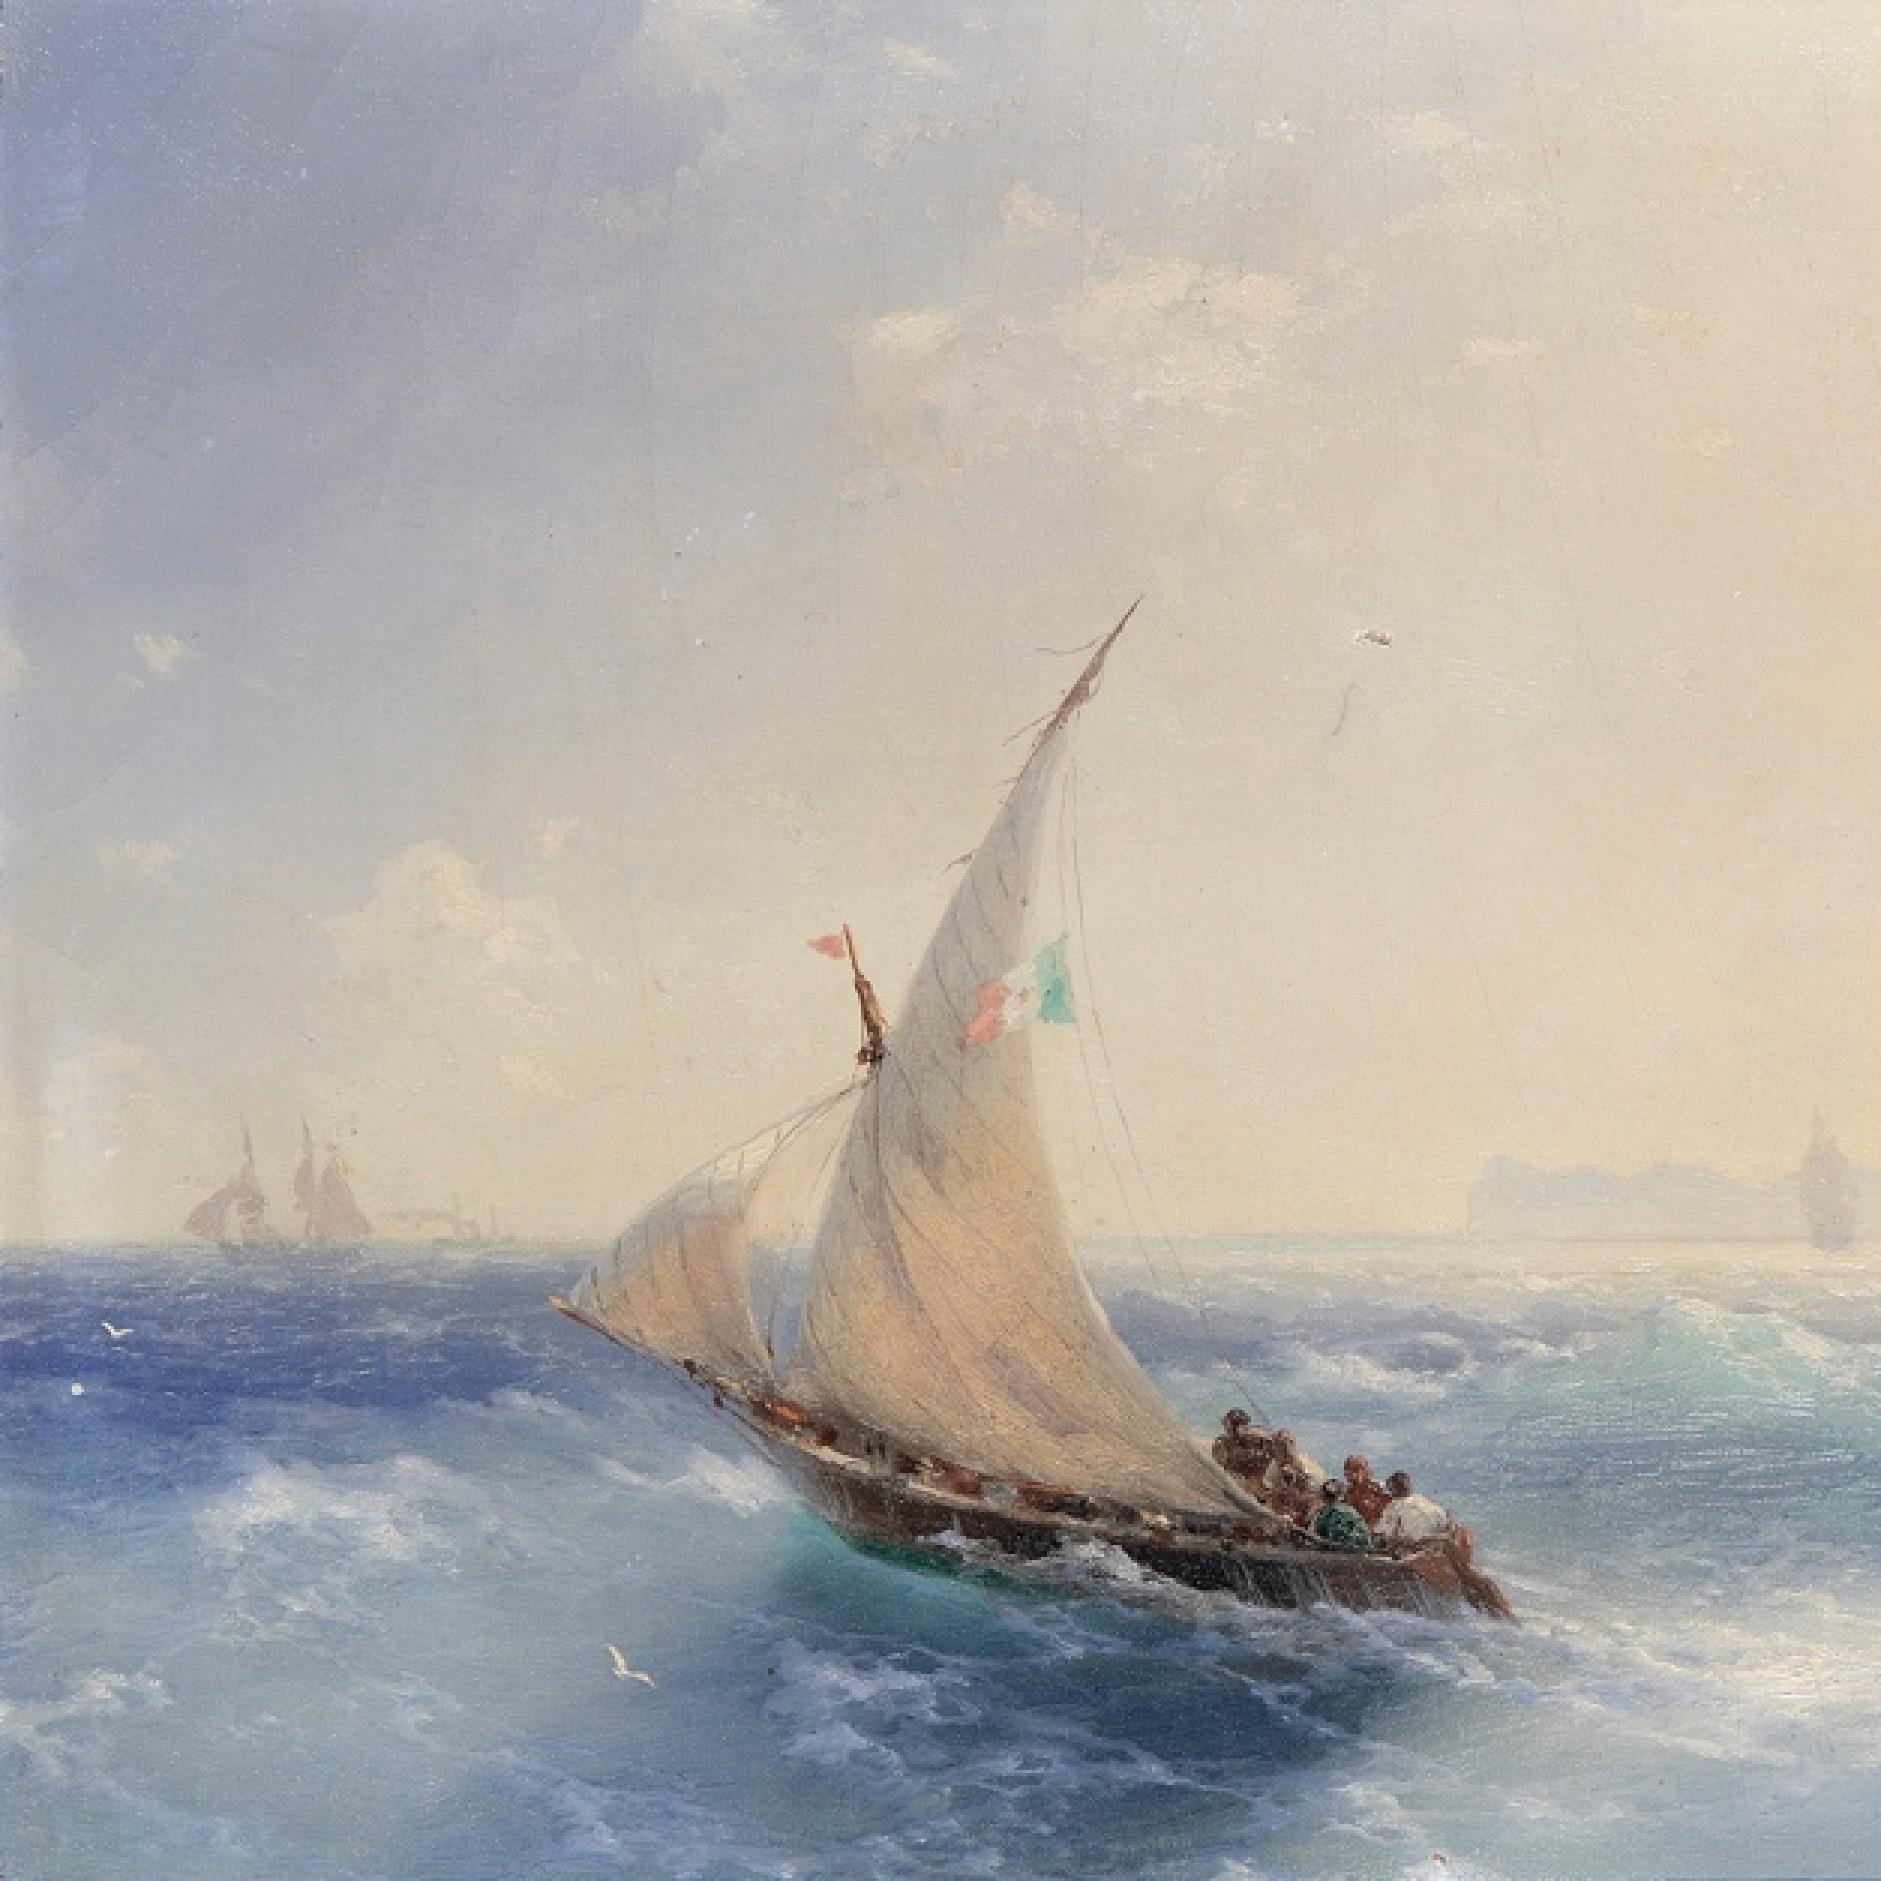 interjero detale Ivan Aivazovskuy - gabenimas i ischia sala